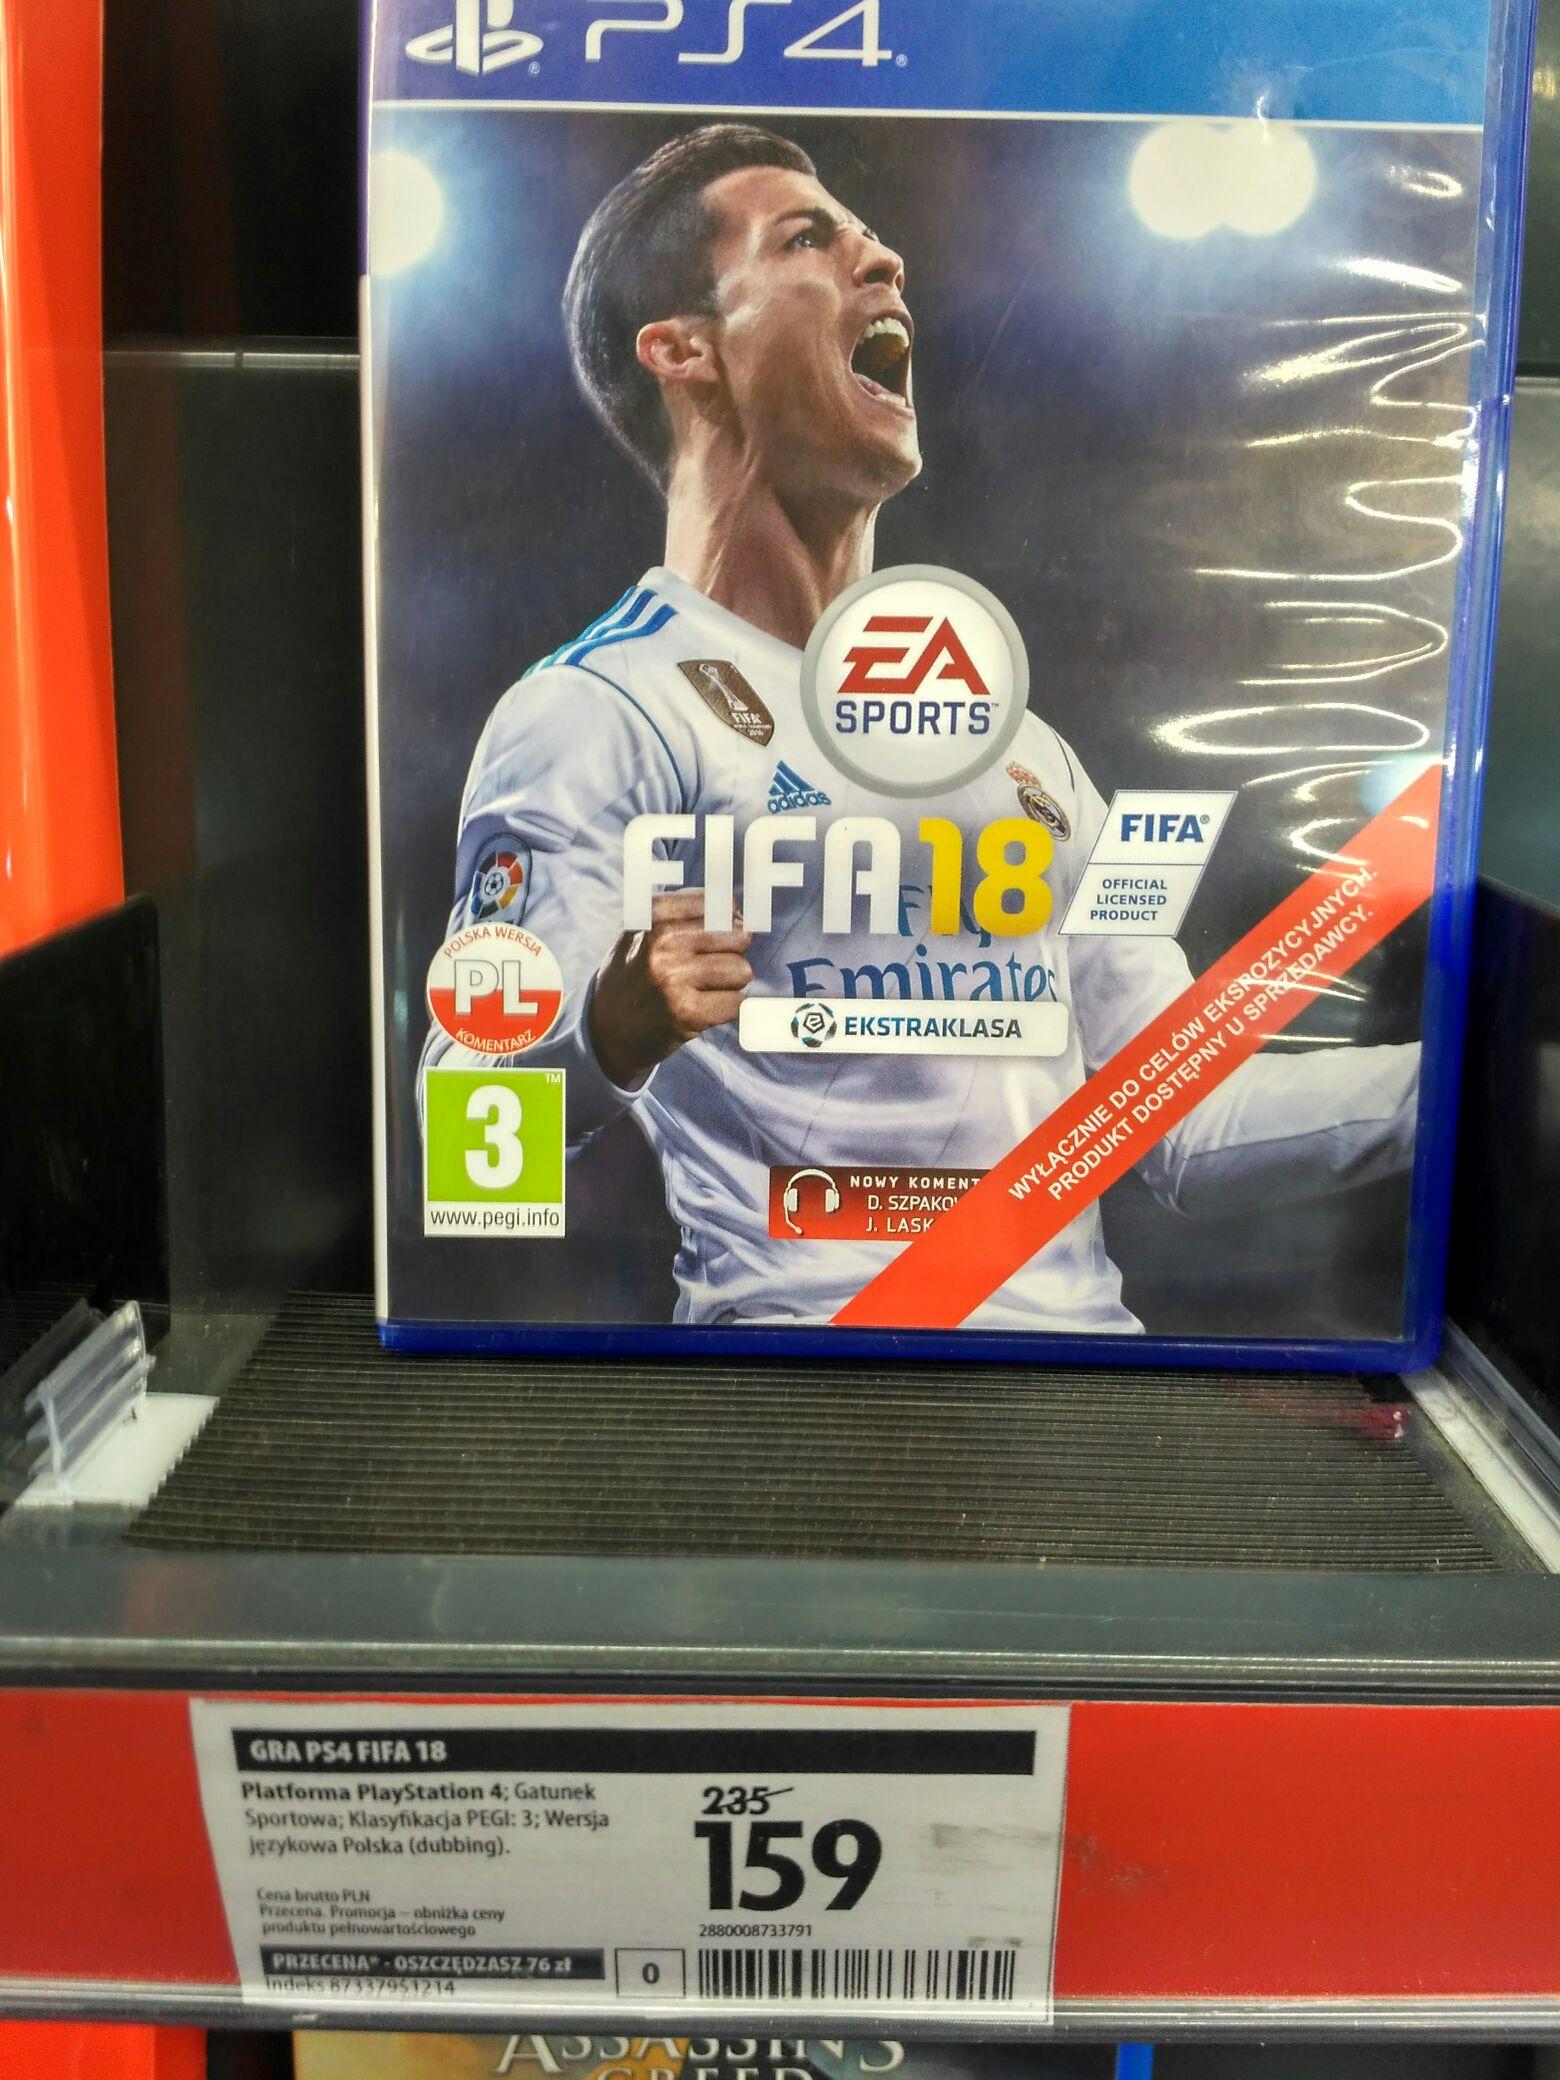 FIFA 18 PS4 Media Expert